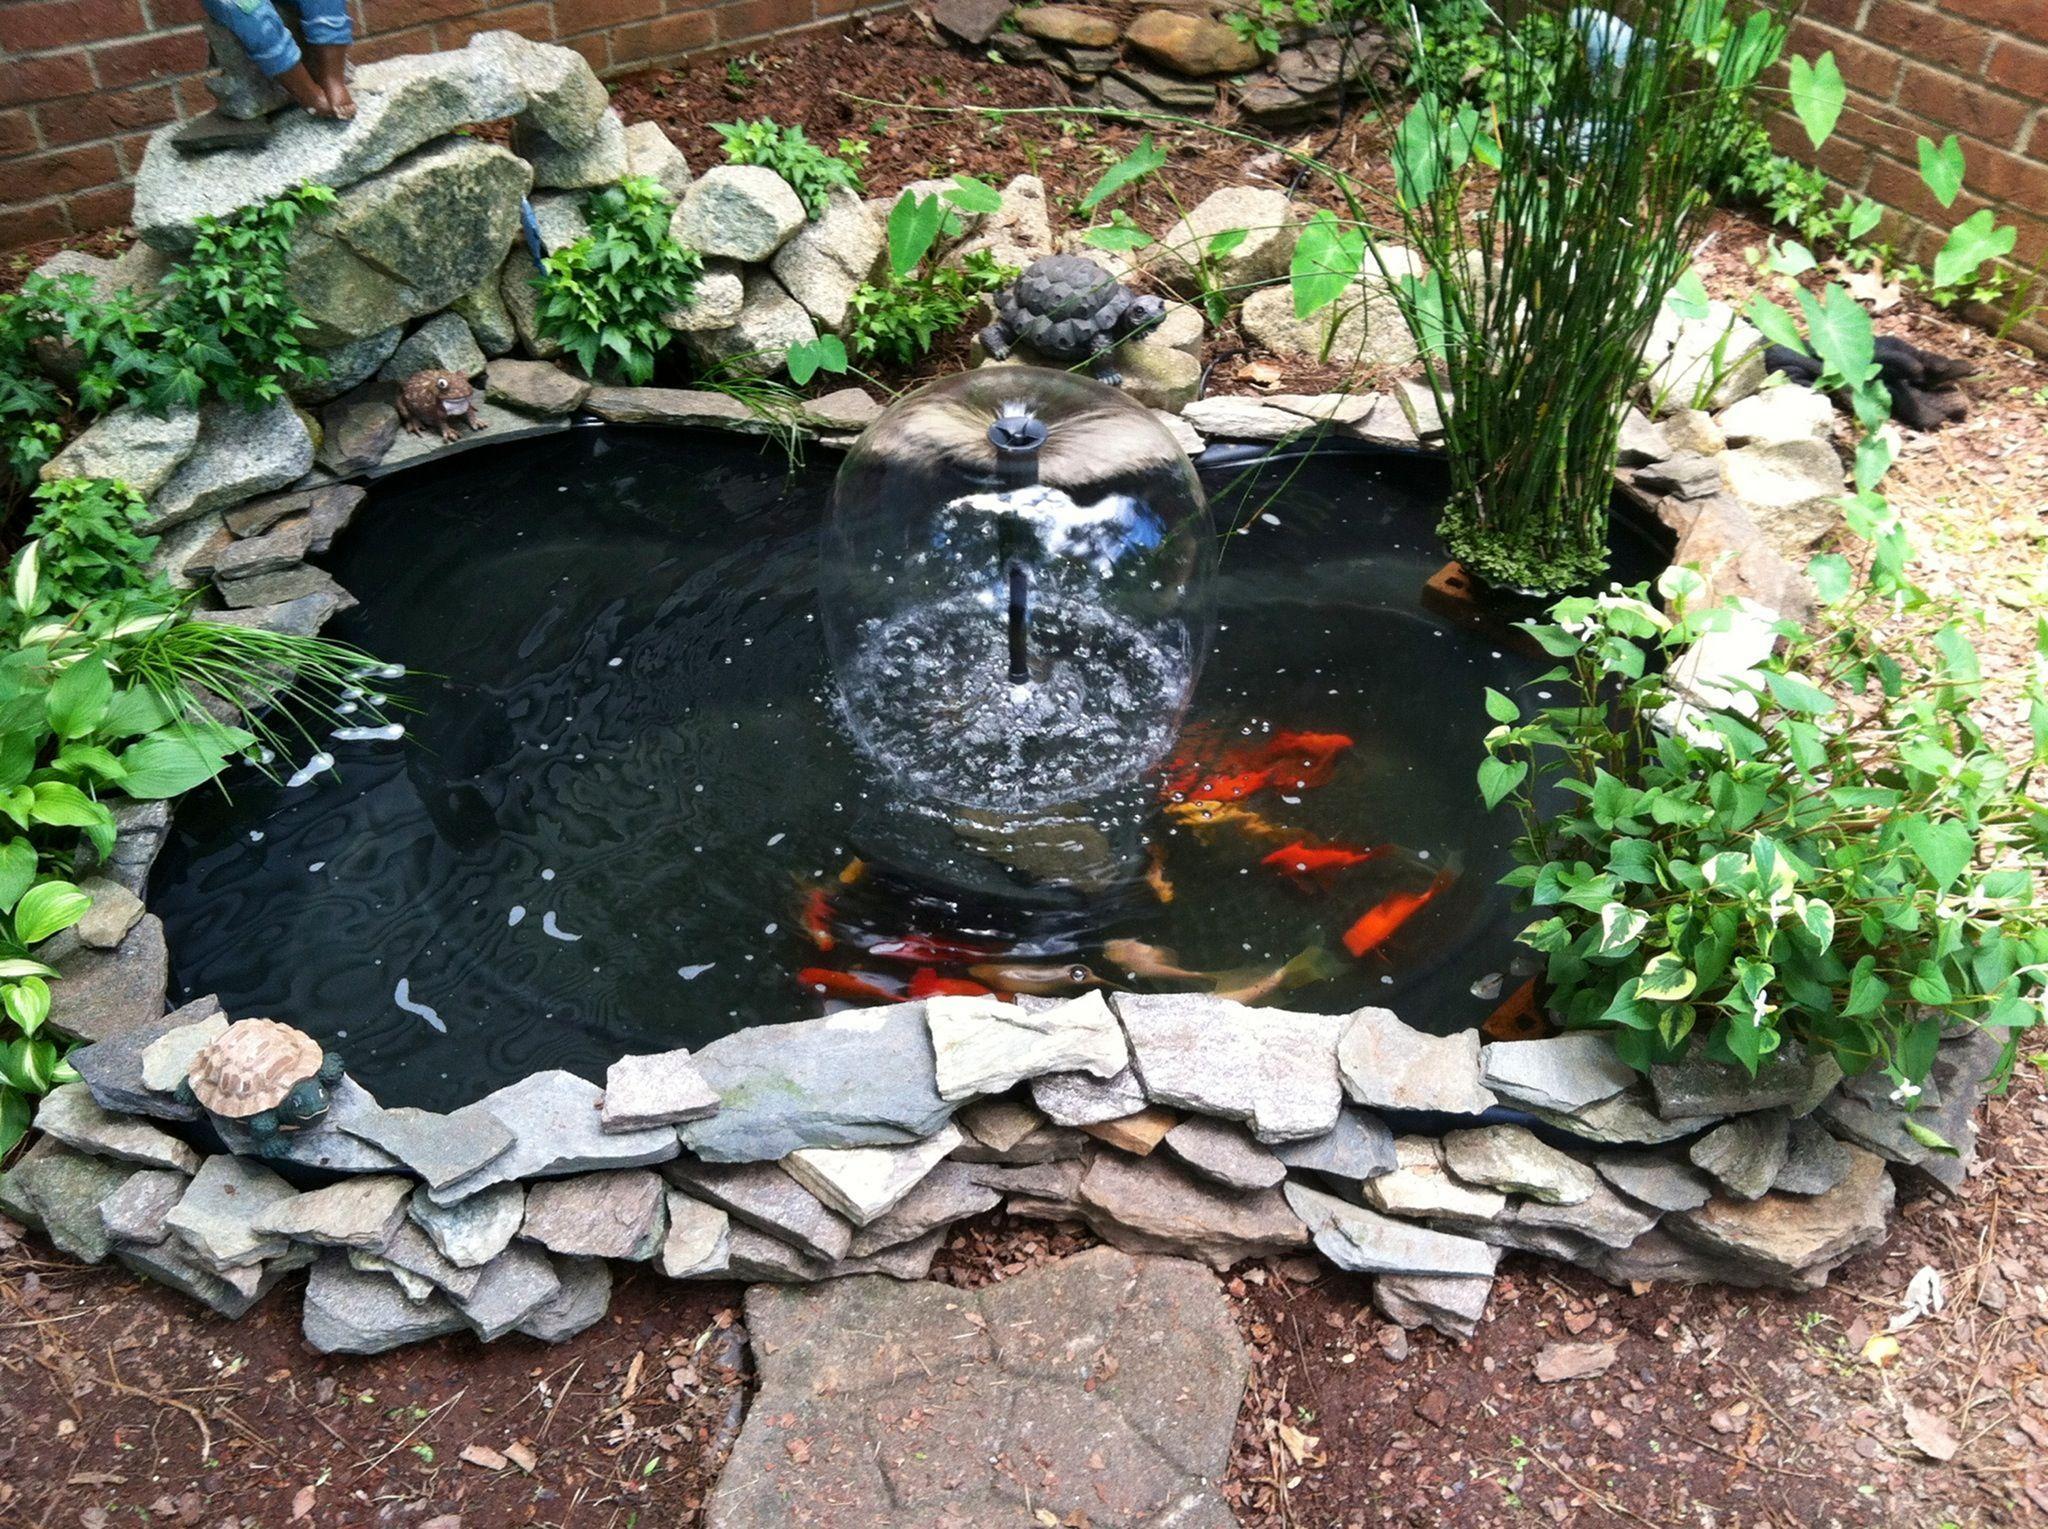 Diy Koi Fish Pond Ideas 10 Roomy Fish Pond Gardens Outdoor Fish Ponds Garden Pond Design Diy backyard koi pond